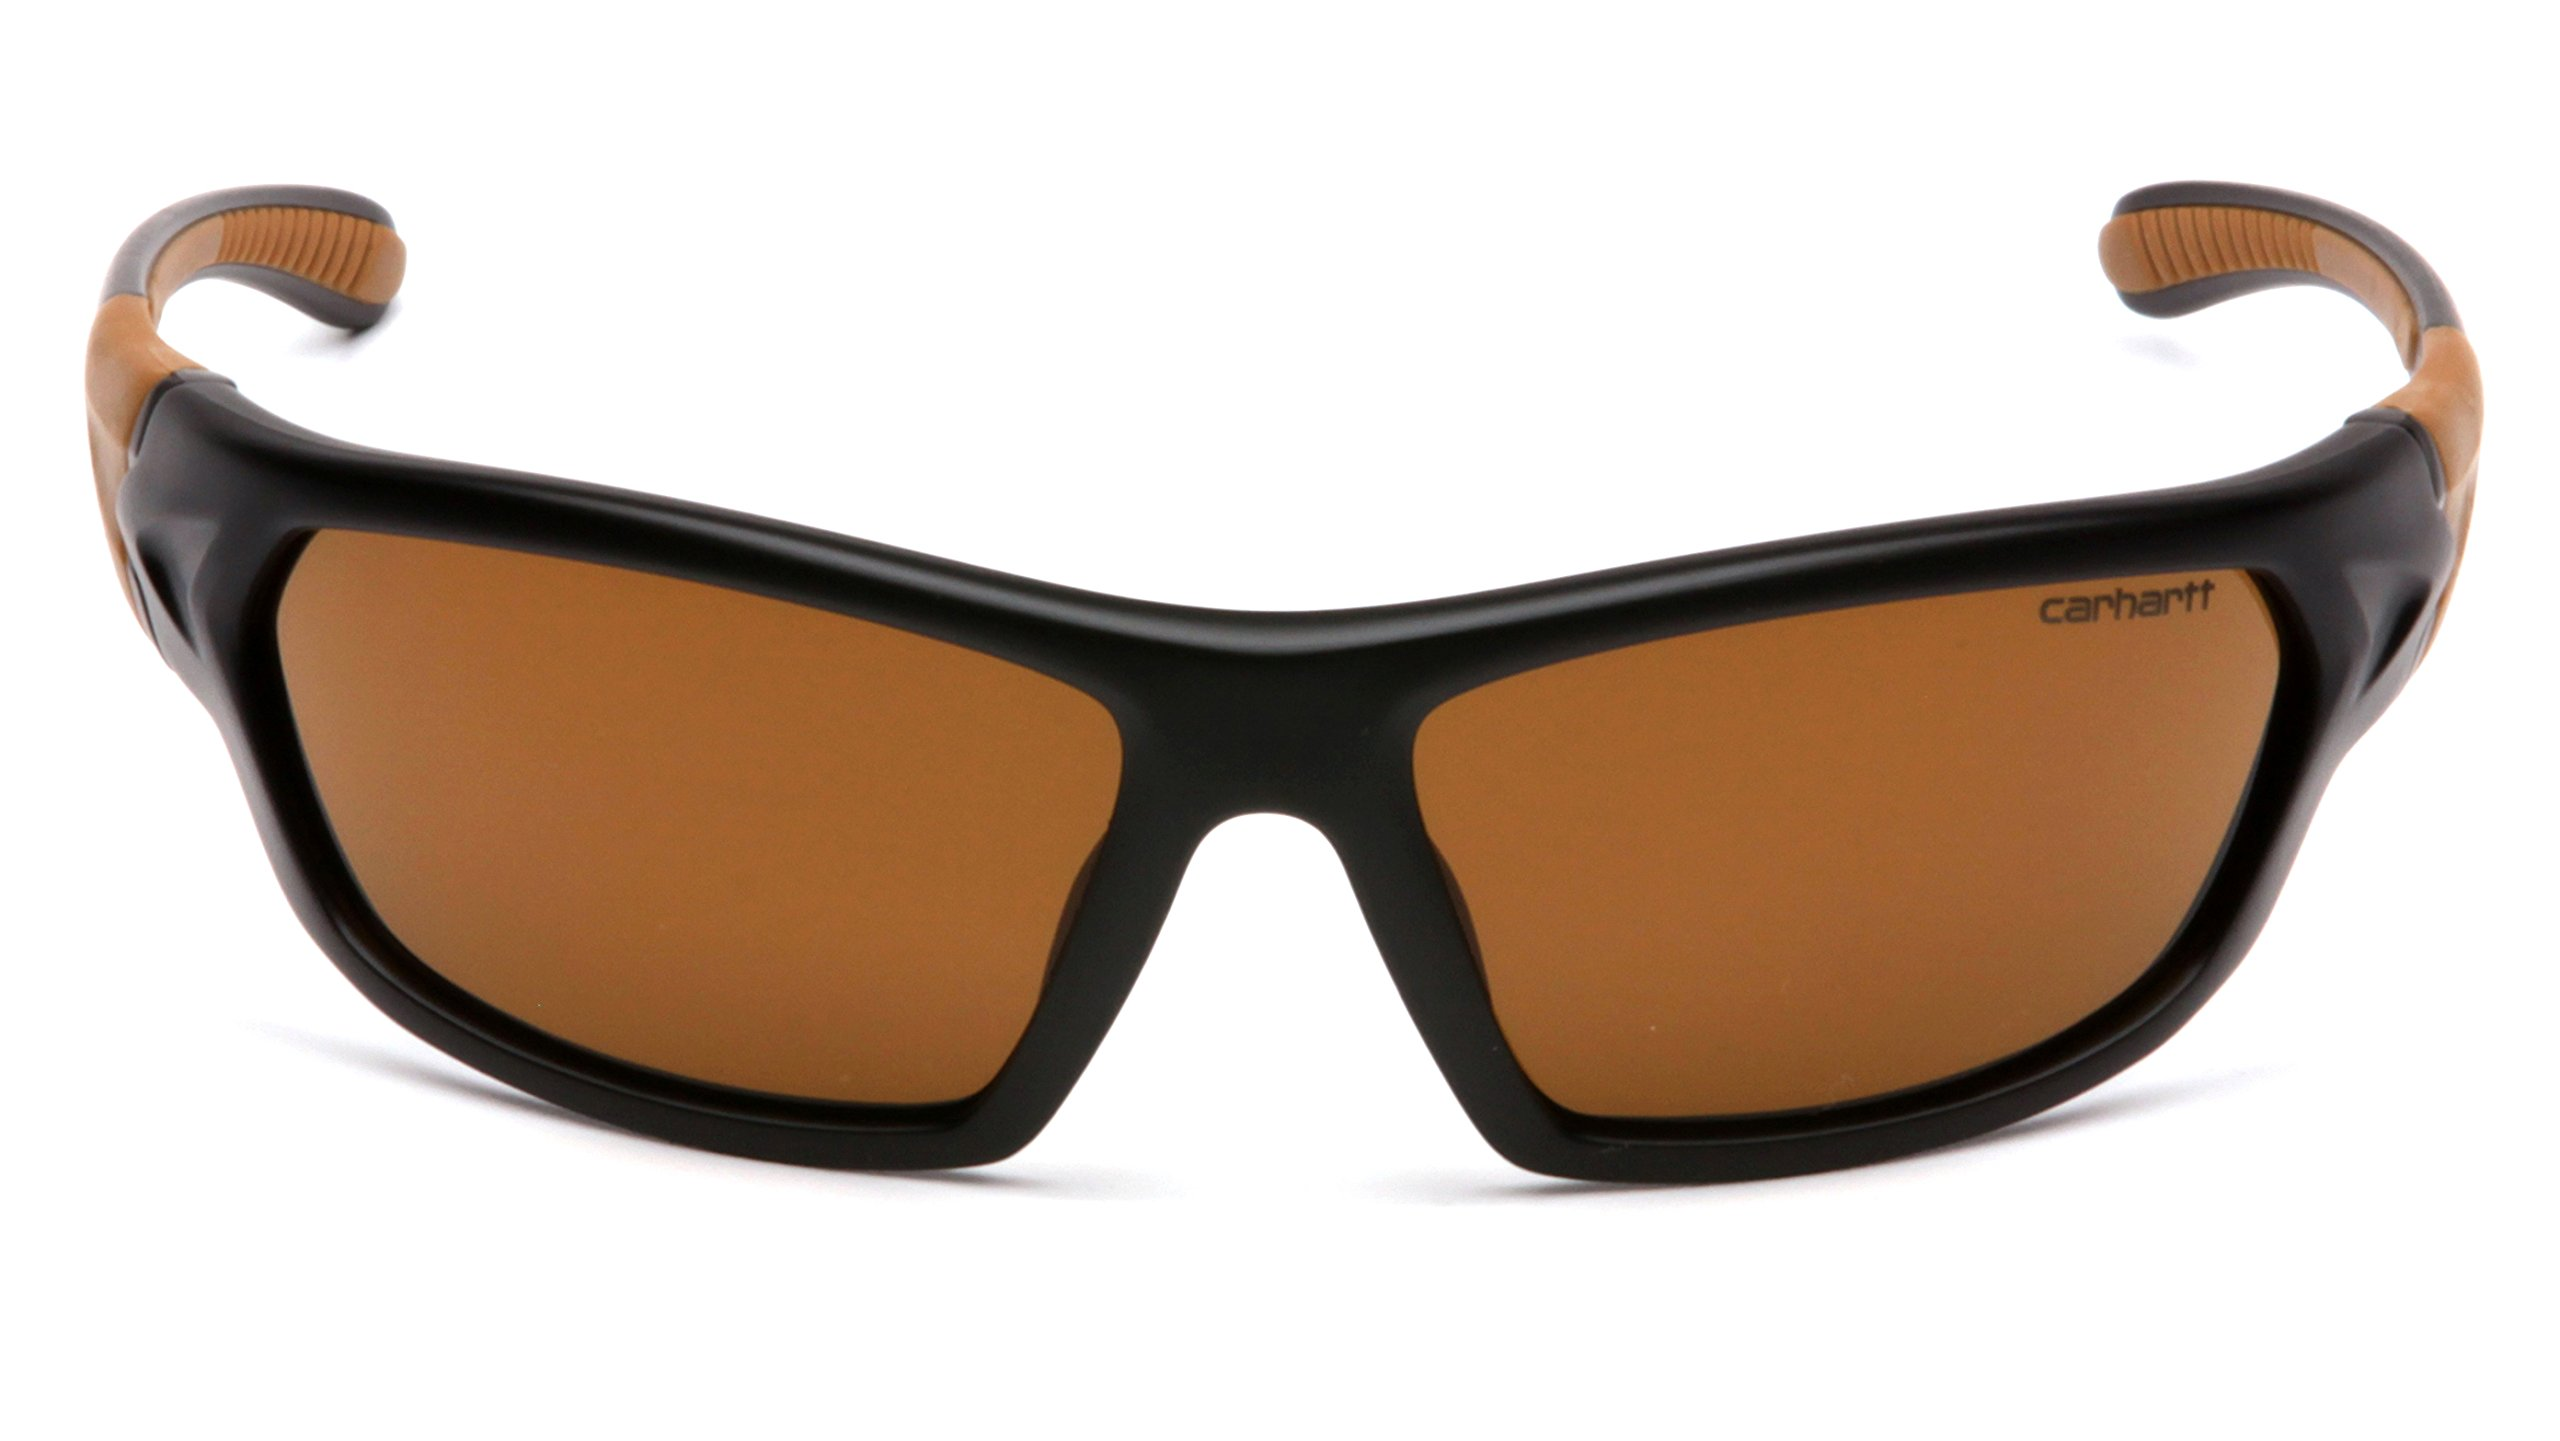 Carhartt Carbondale Safety Sunglasses with Sandstone Bronze Lens Black/tan